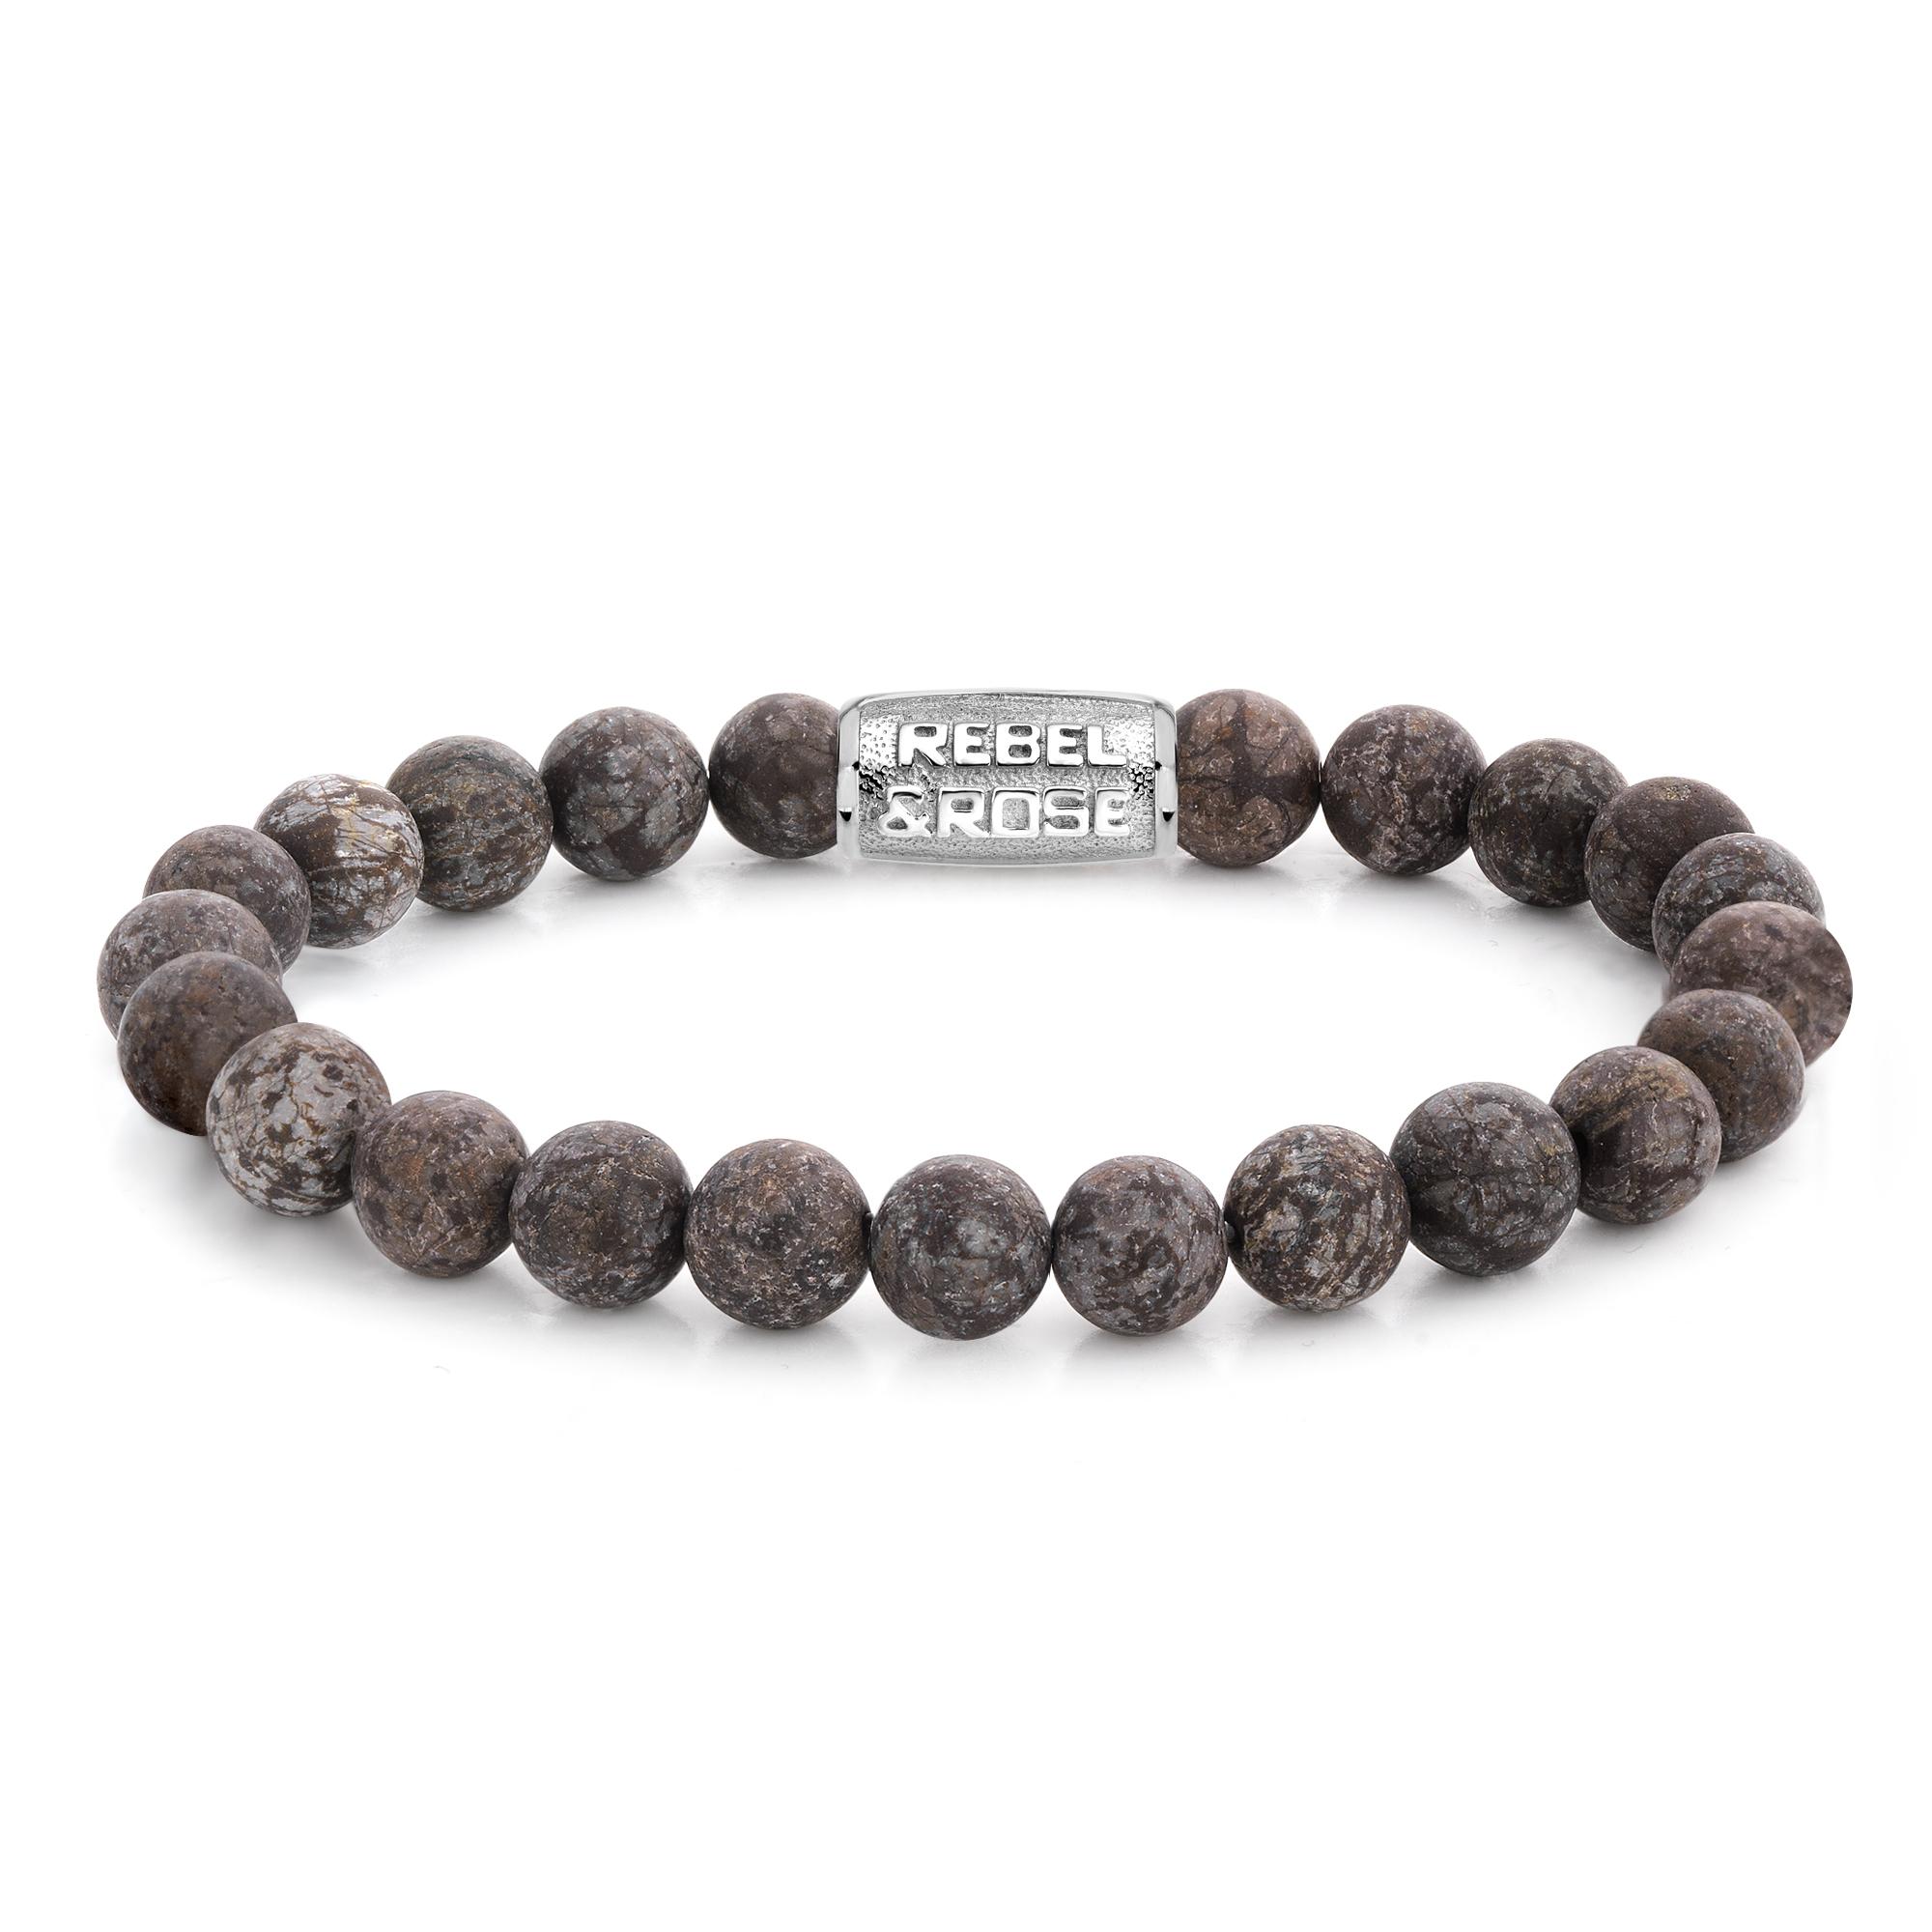 Rebel and Rose RR 80031 S Rekarmband Beads Matt Brown Sugar zilverkleurig bruin 8 mm XL 21 cm